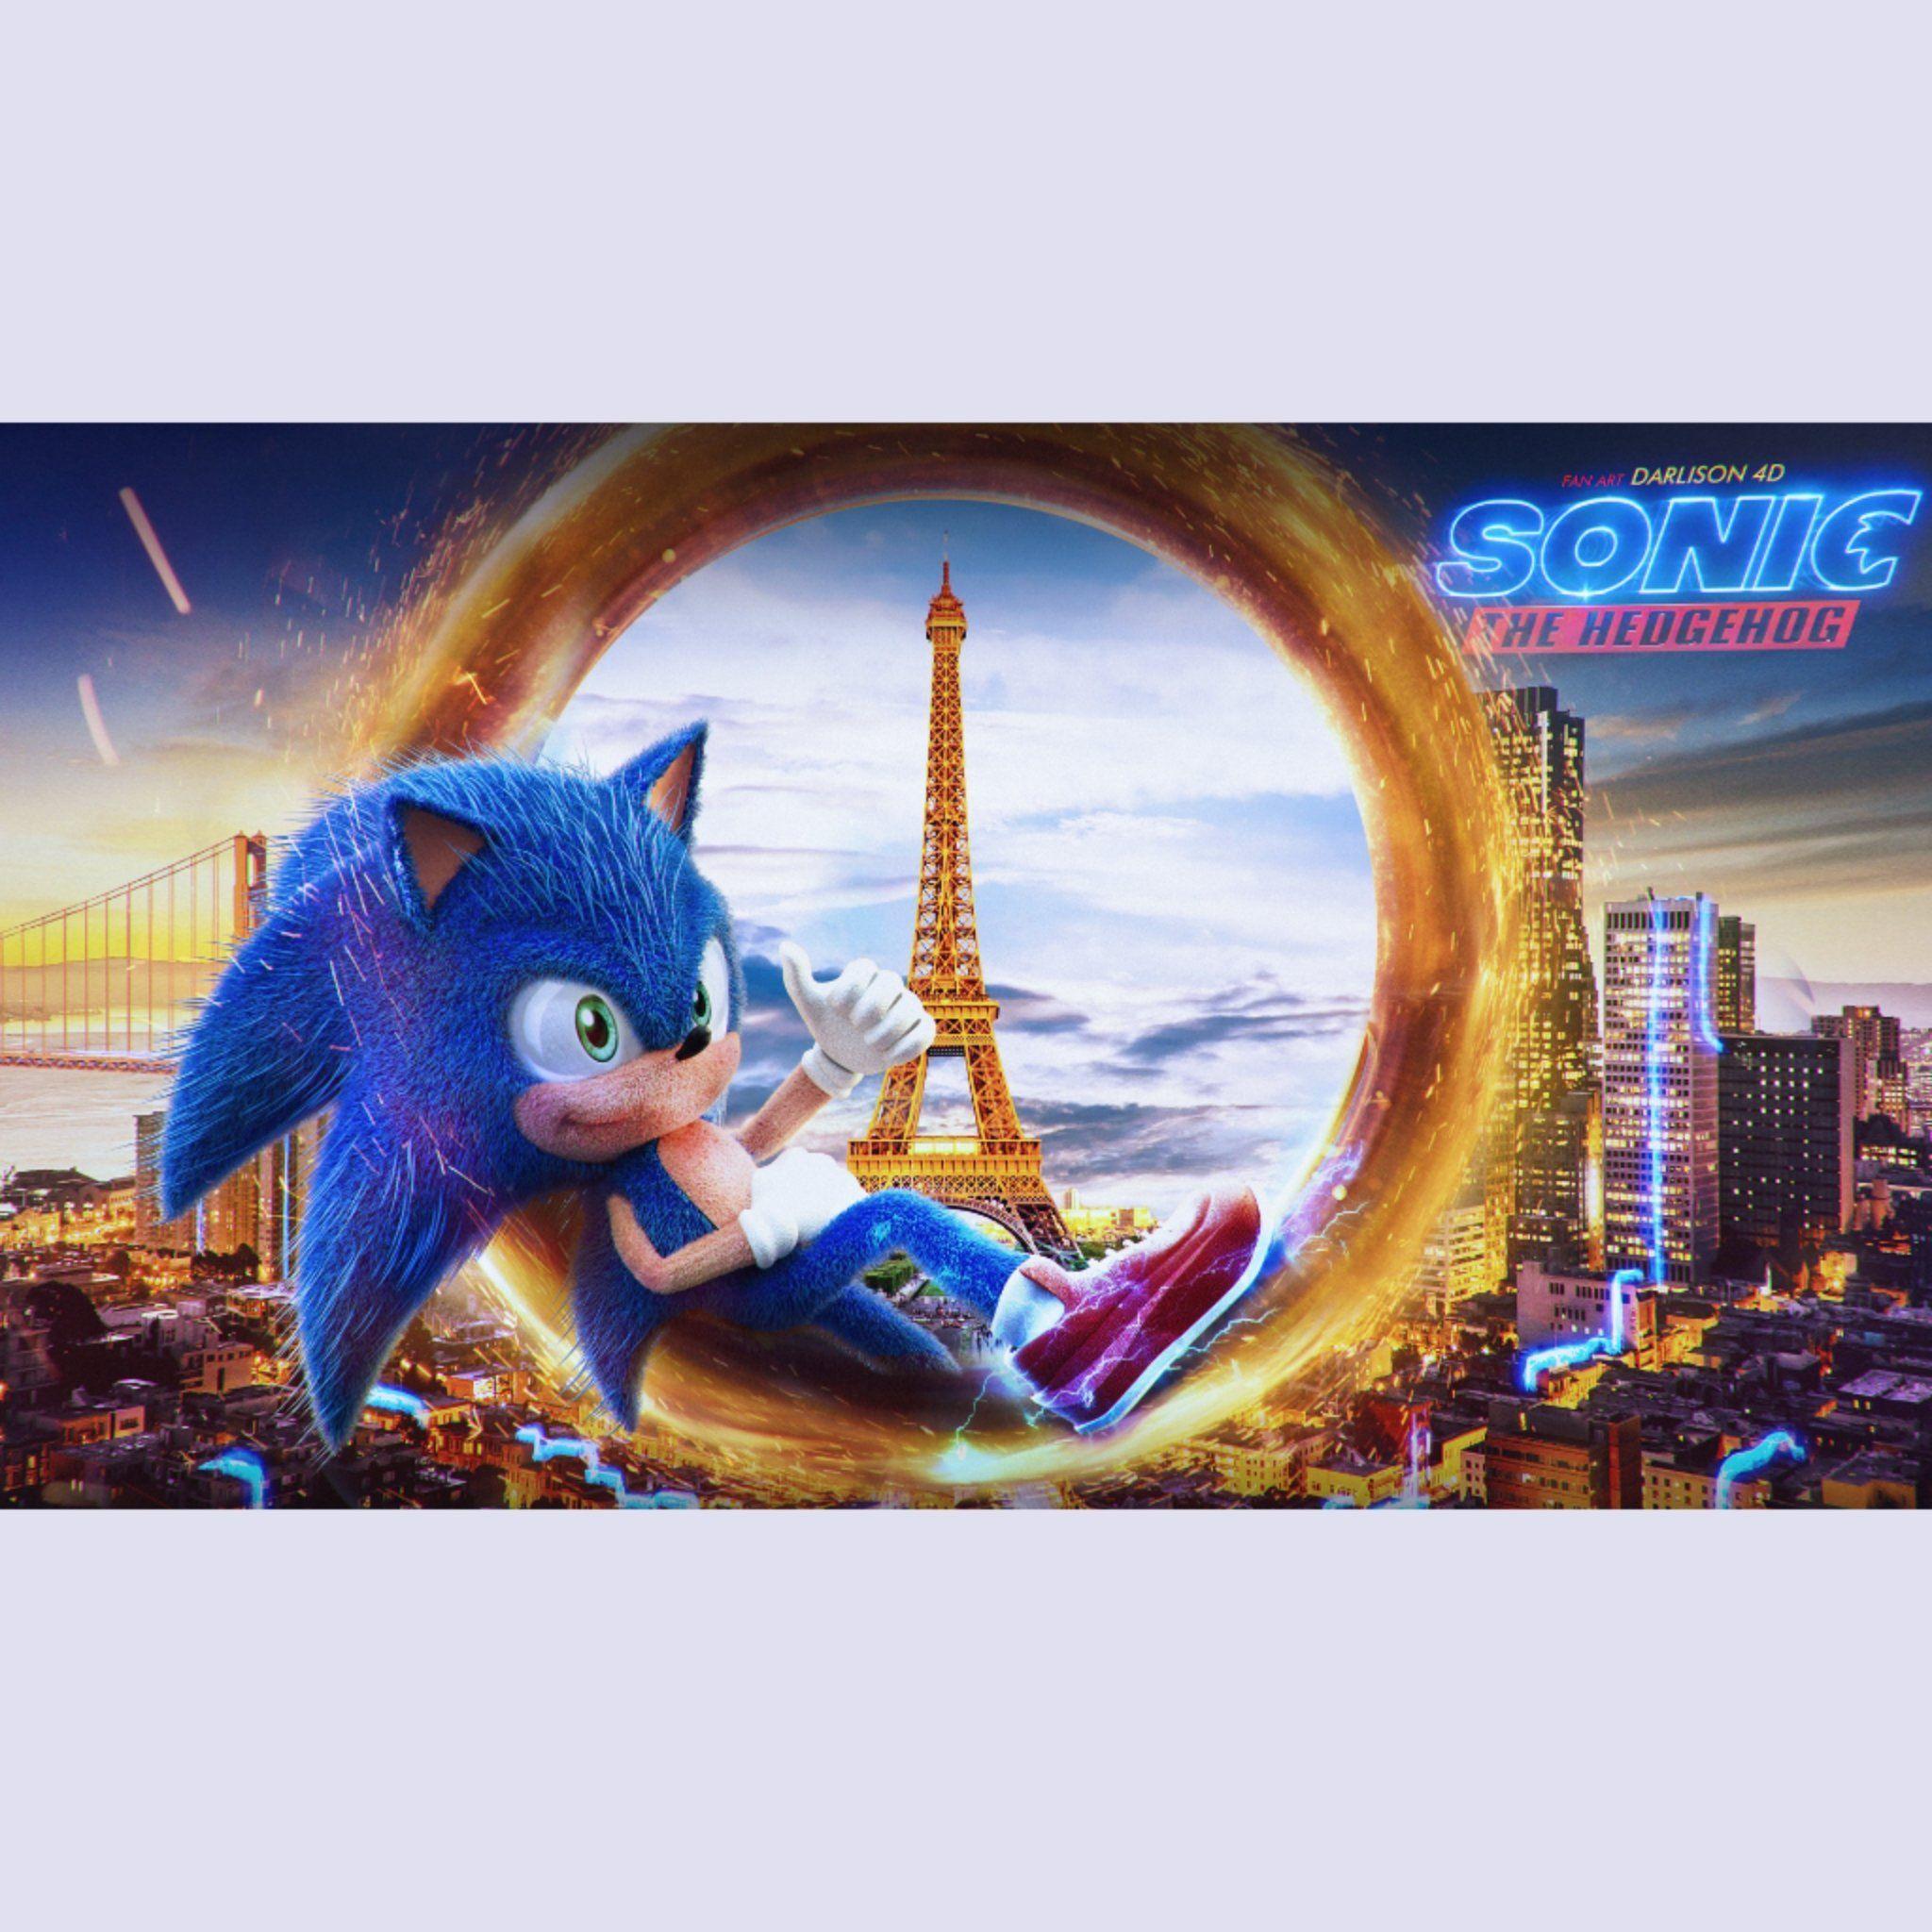 Ver Sonic La Pelicula Online Espanol 2020 Peliculas Ver Peliculas En Linea Gratis Mira Peliculas Sonic Heroes Sonic Movie Redesign Sonic The Hedgehog